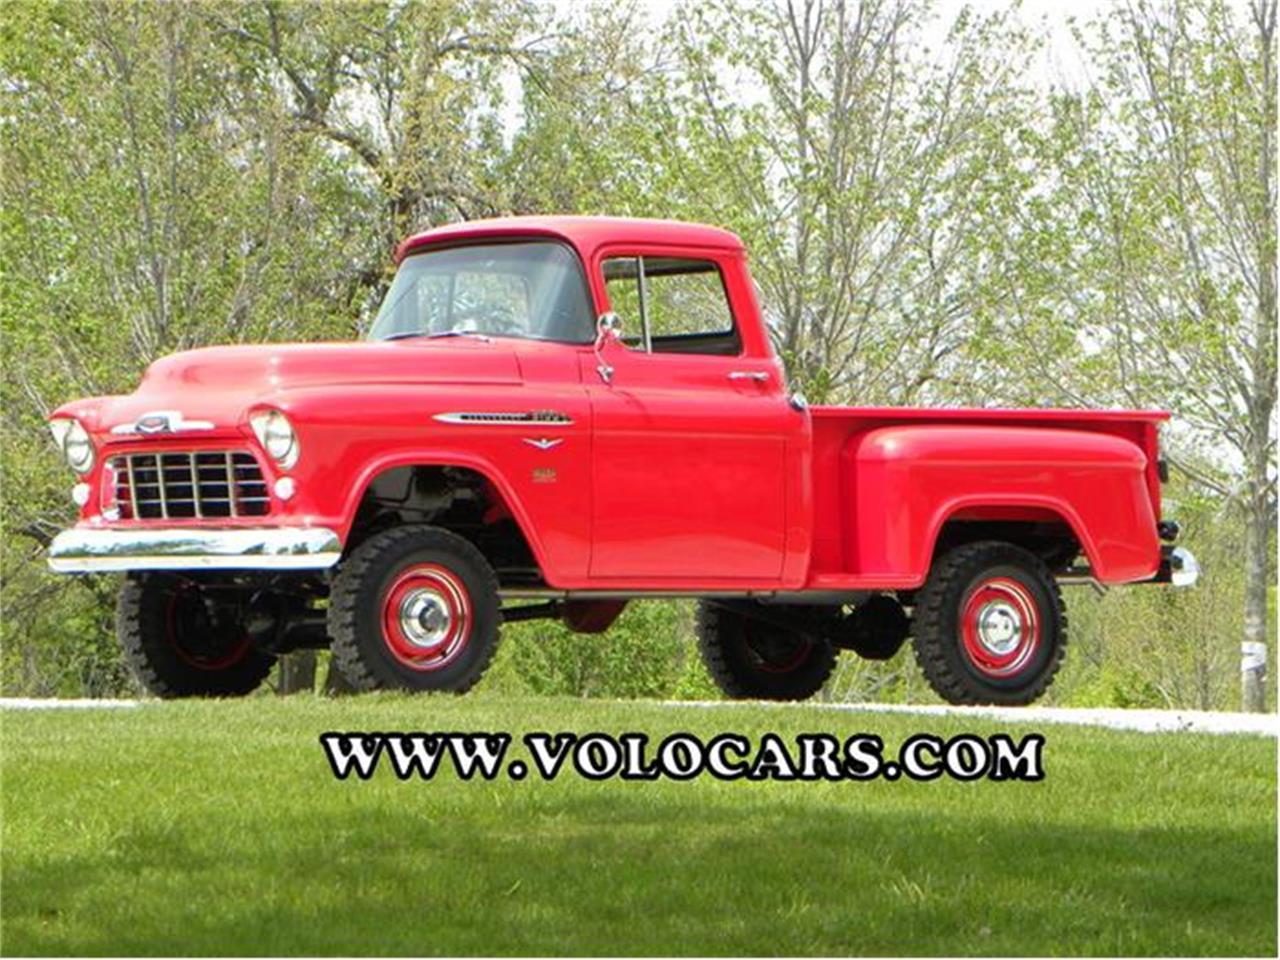 1956 Chevrolet 3100 napco 4x4 stepside pickup in Volo, Illinois